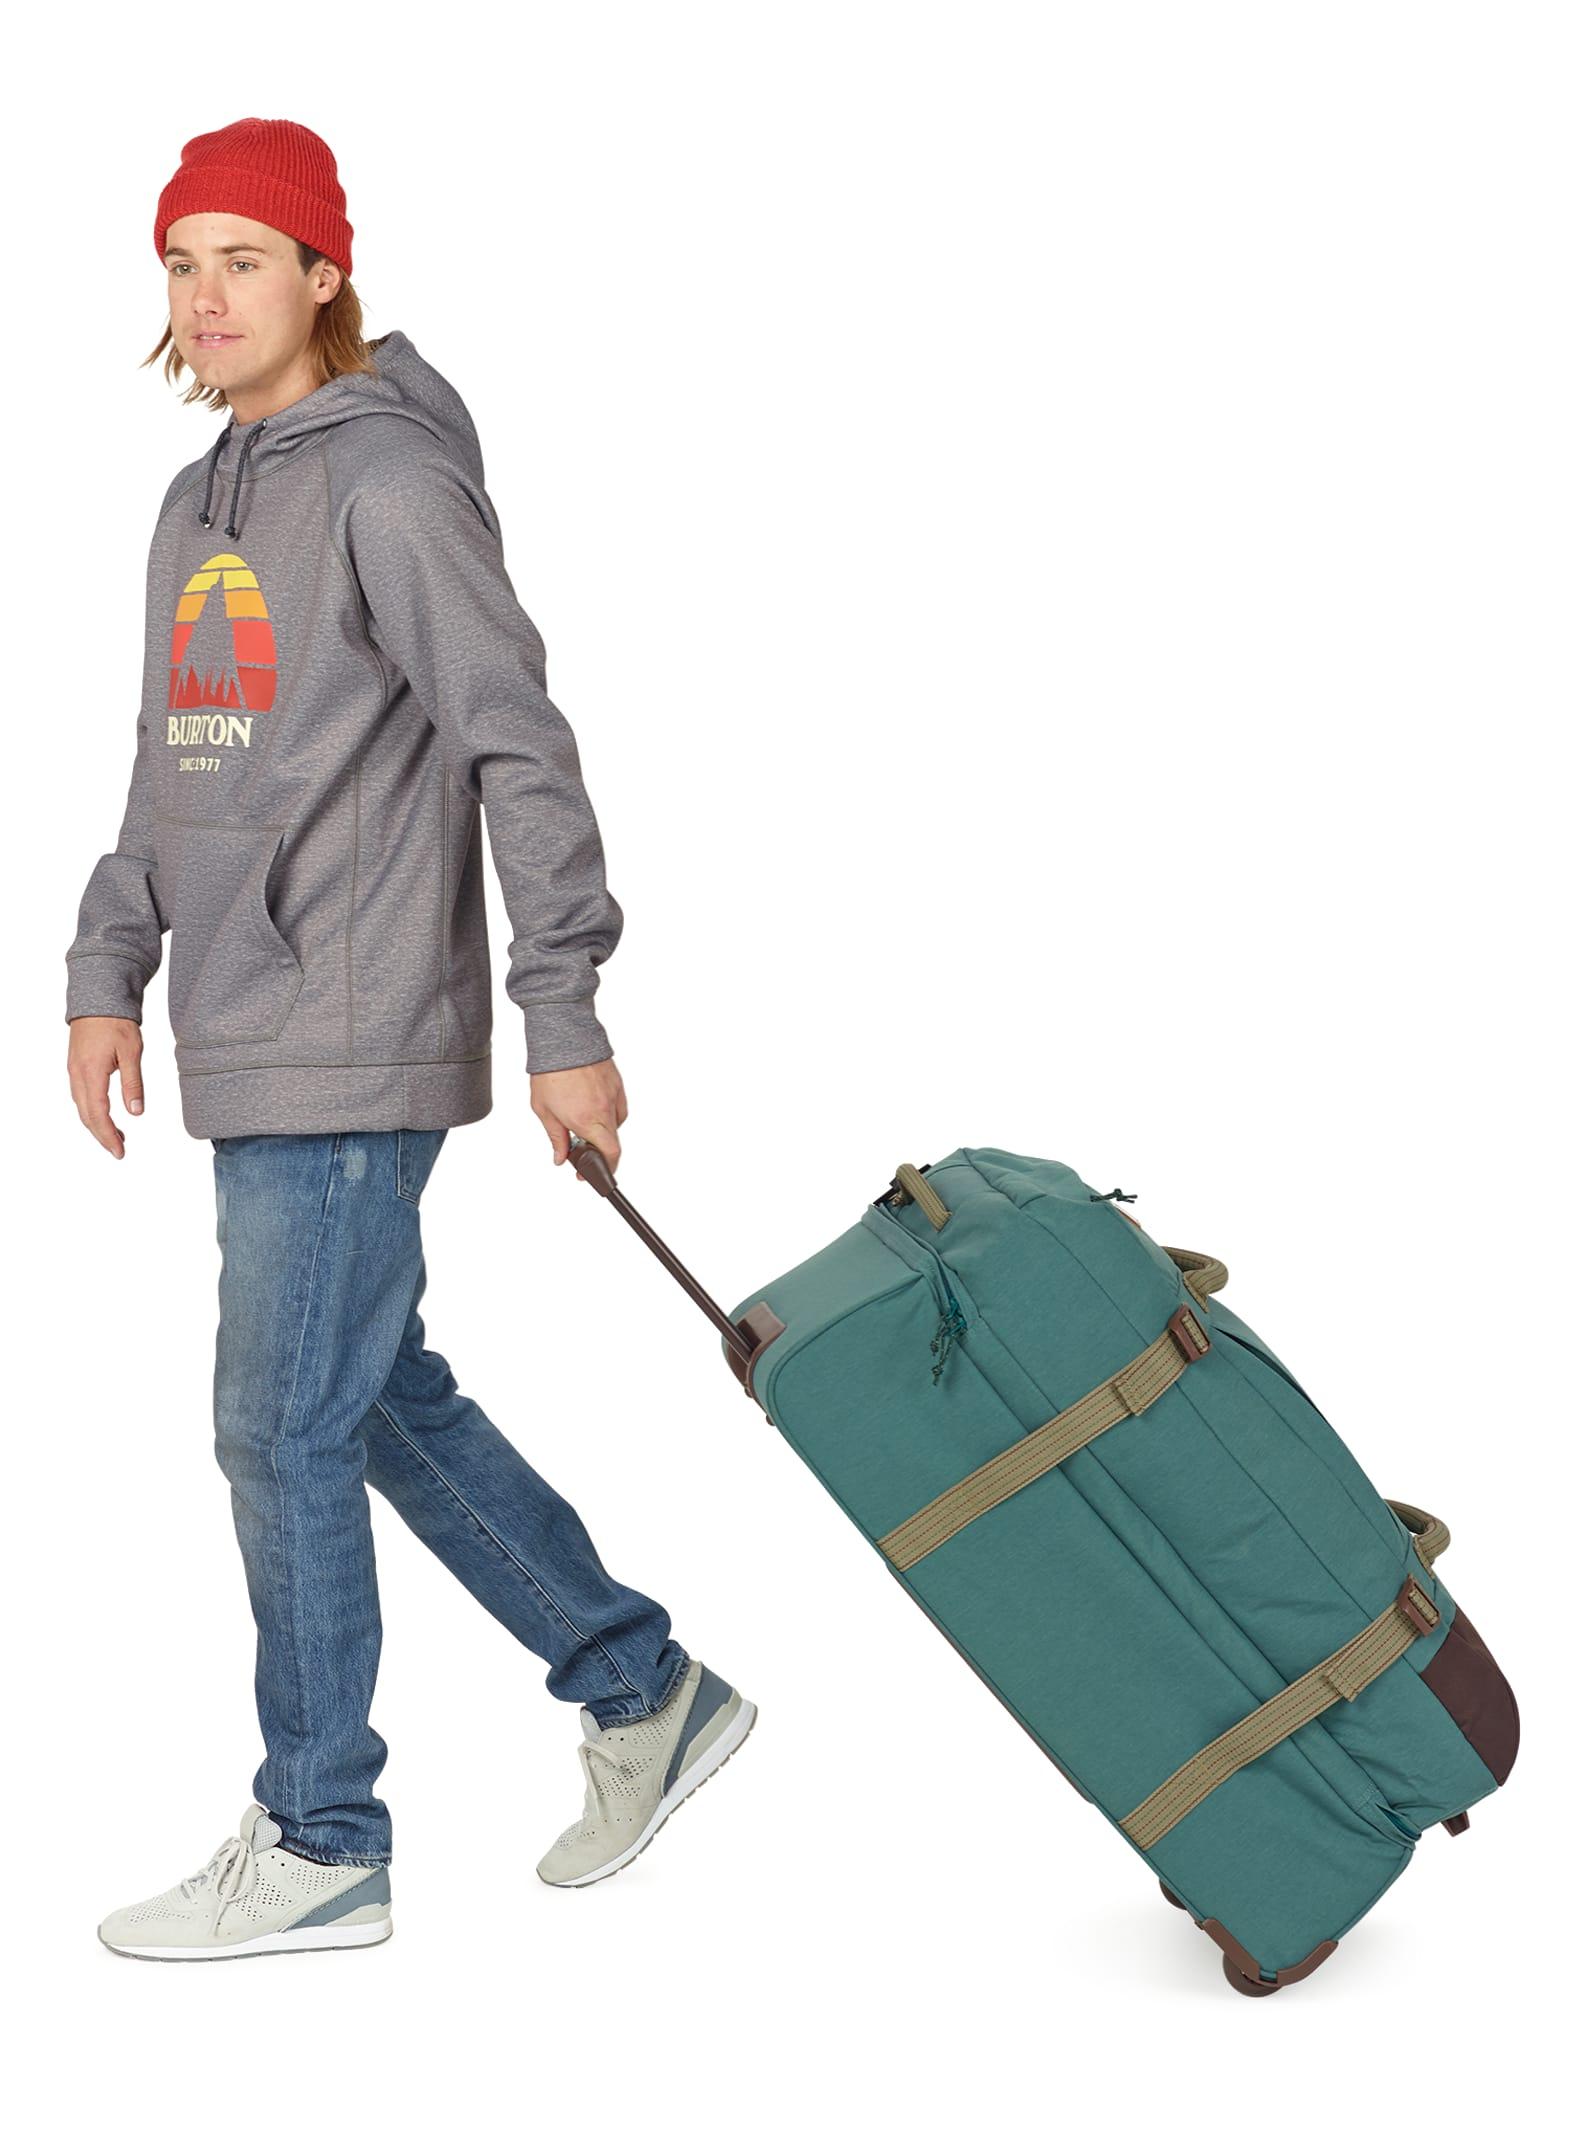 0cf4073bf23a Burton Exodus Roller Travel Bag | Burton Snowboards Fall 2017